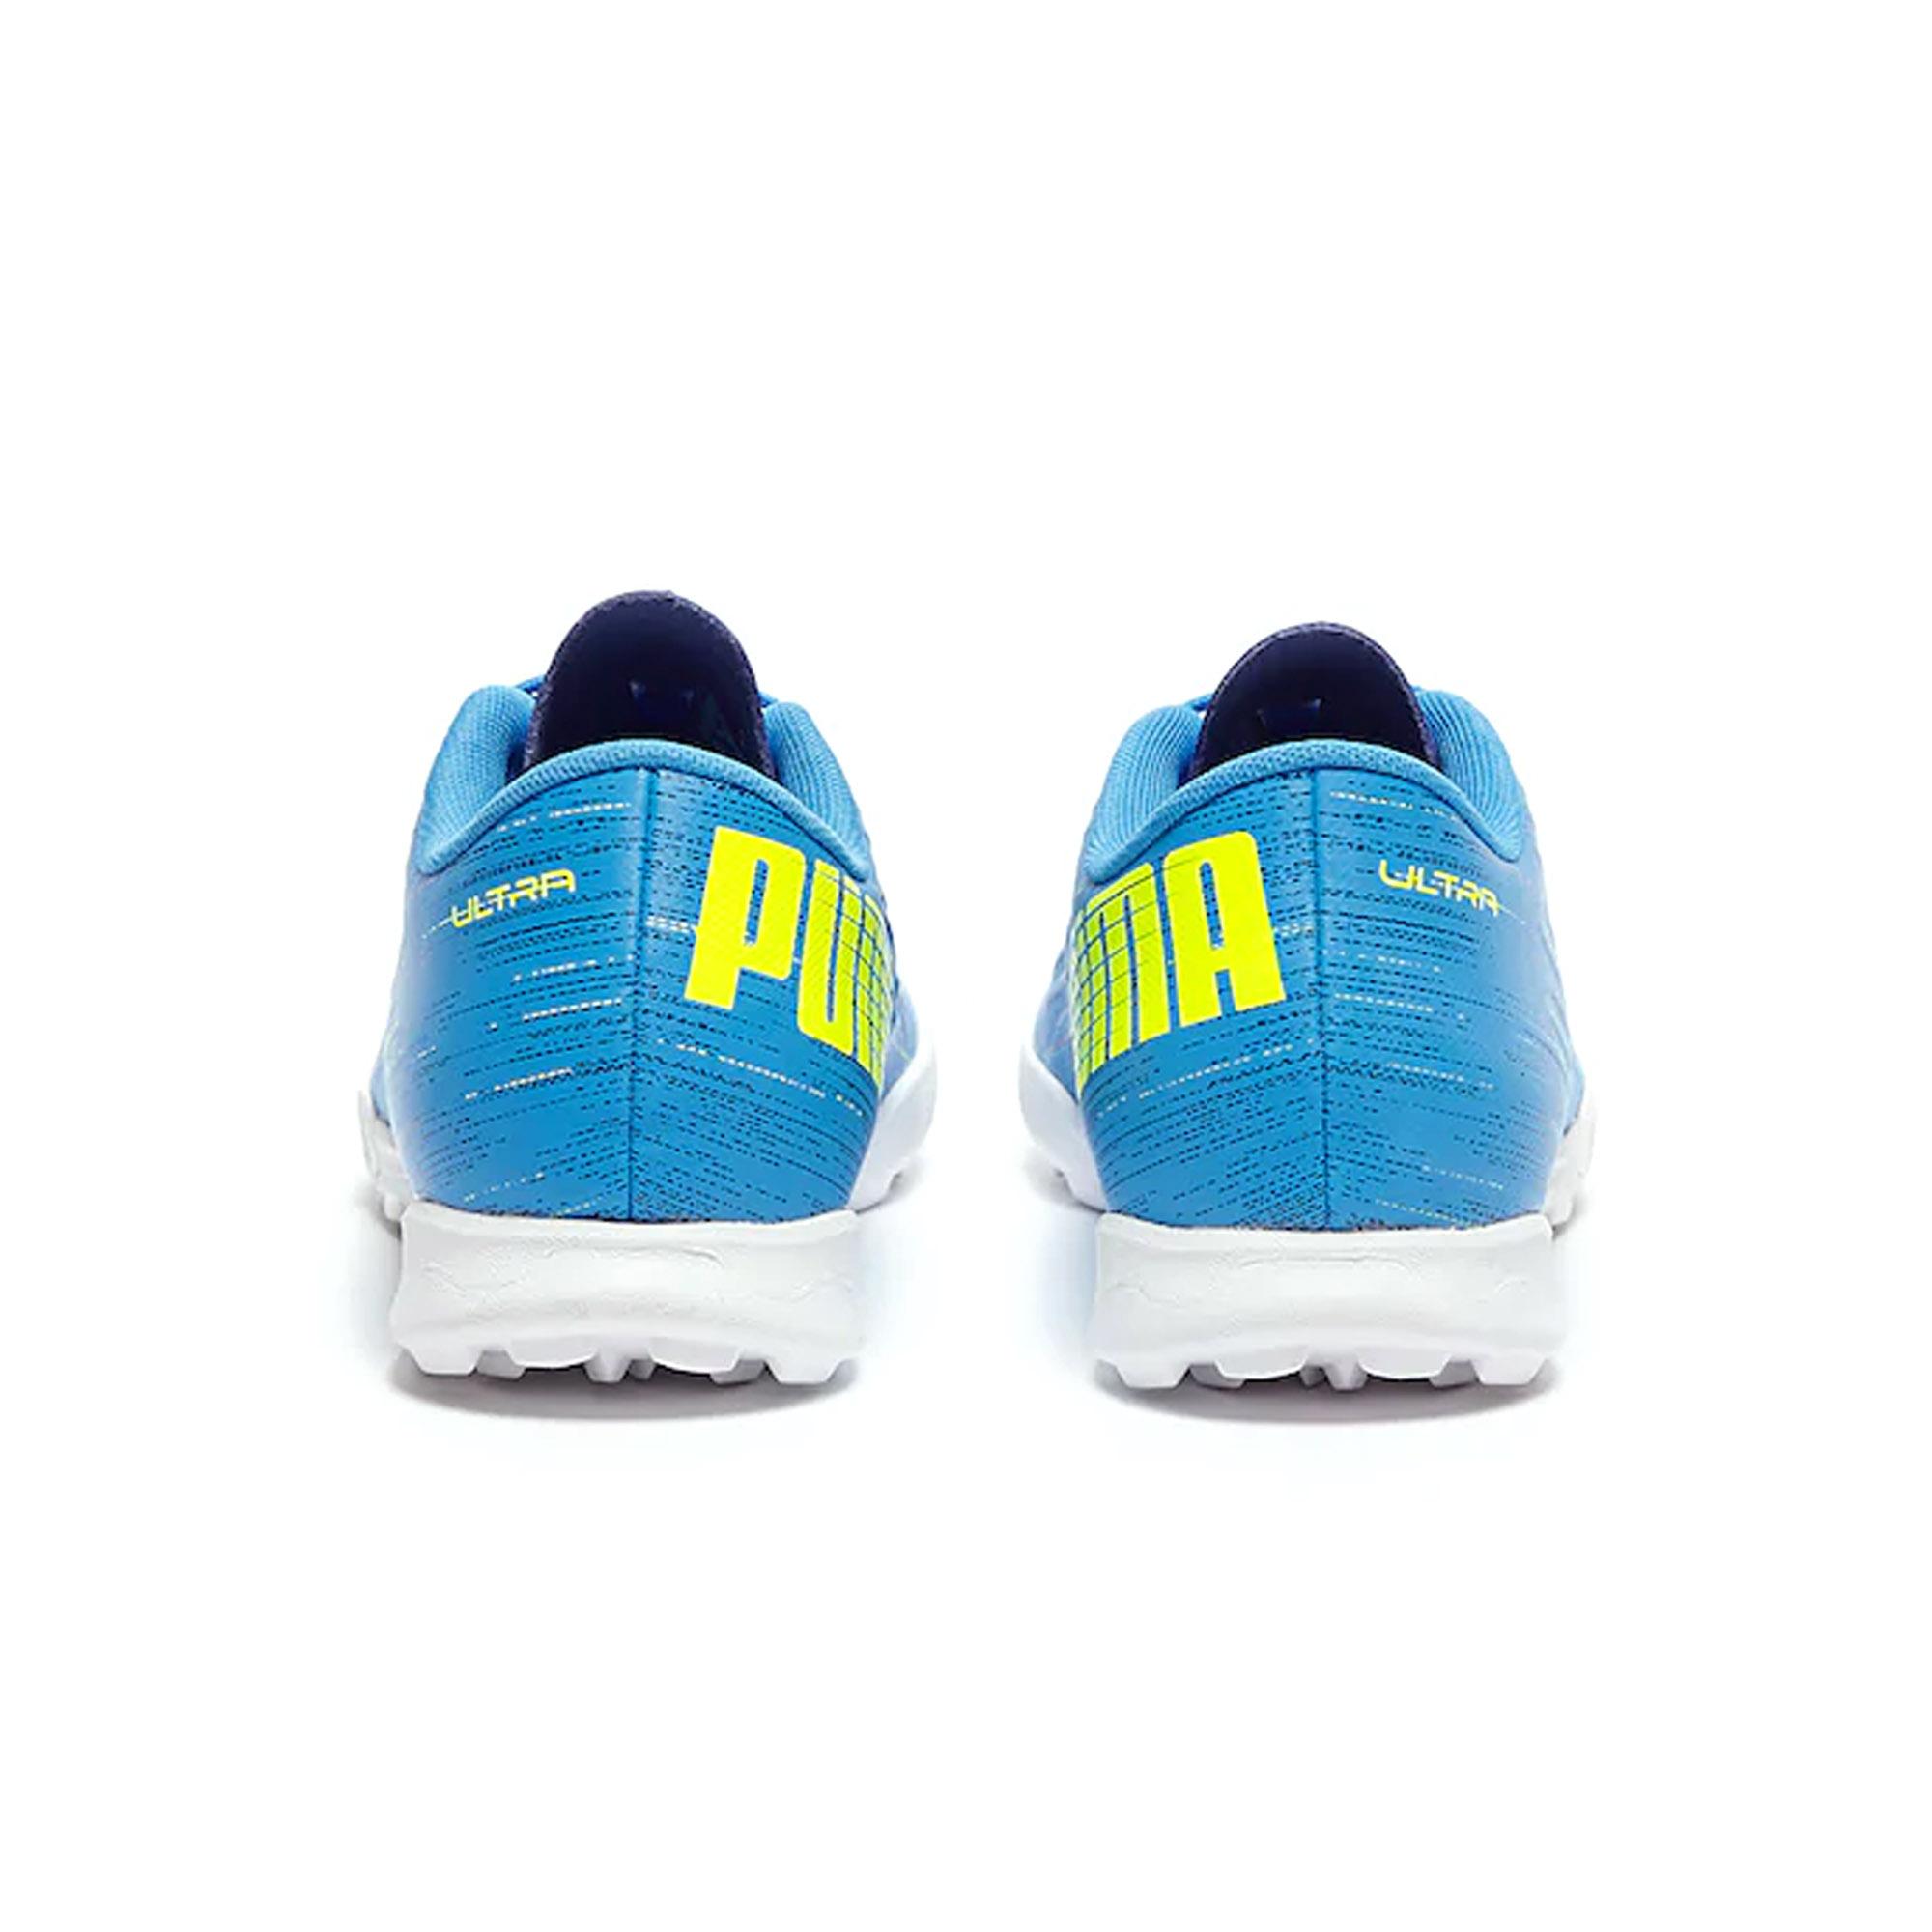 Puma-Ultra-4-2-Kids-TT-Astro-Turf-Football-Chaussure-Bleu miniature 8